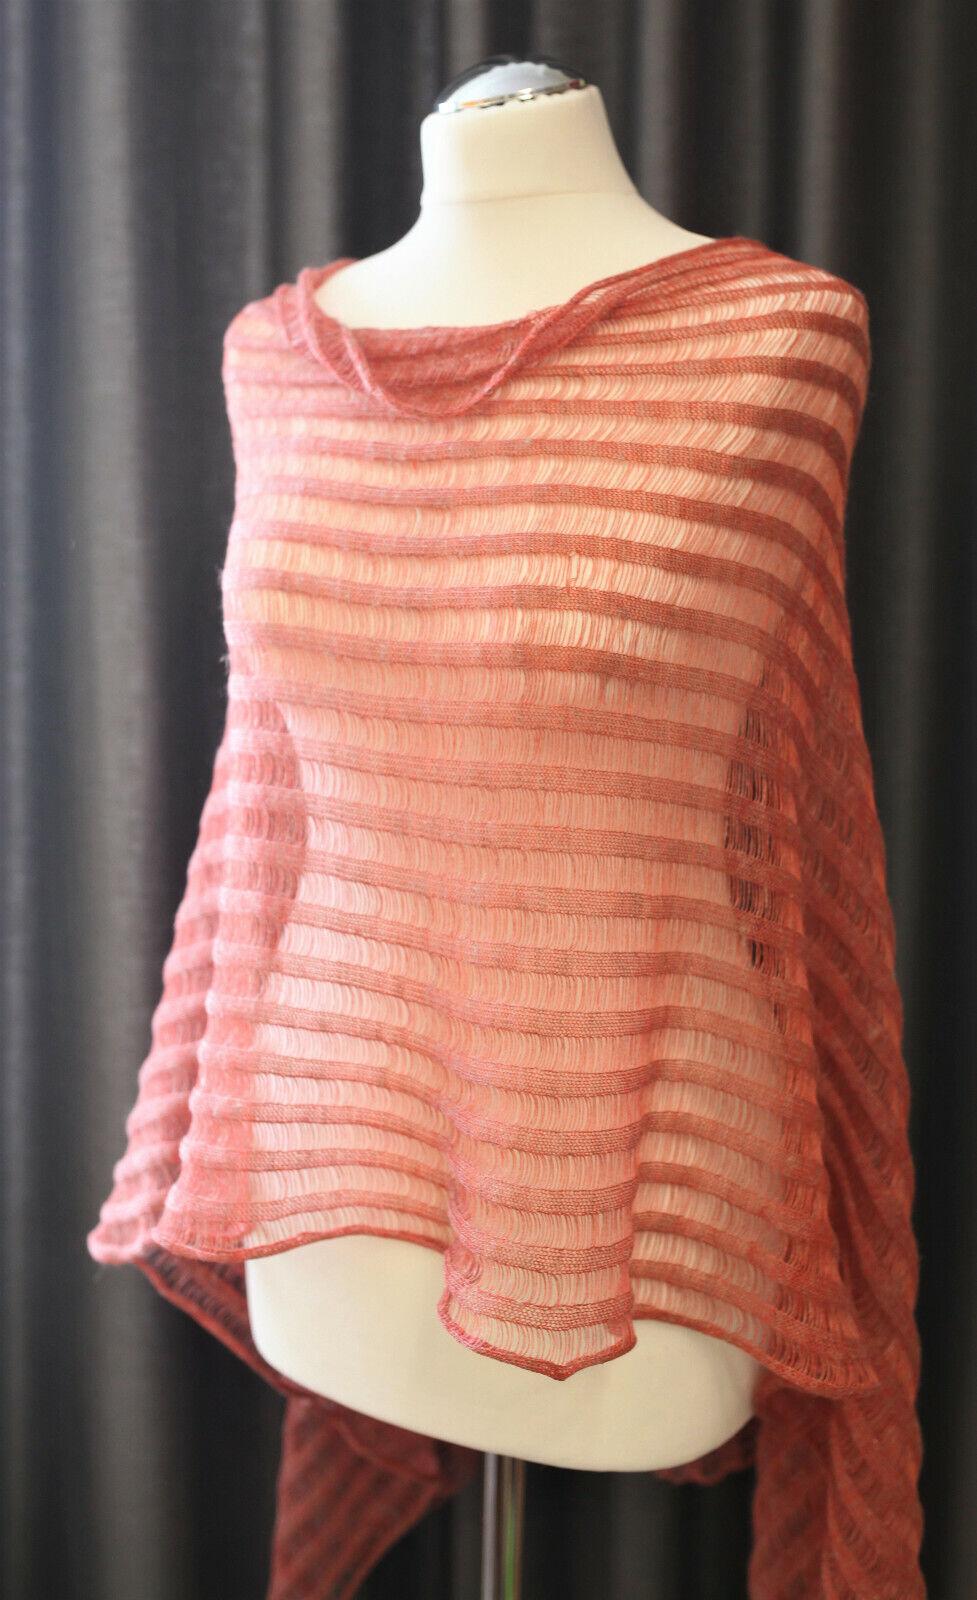 Linen Handmade Knitted Womens Poncho, Knit Shawl, Luxurious Lightweight Summer P